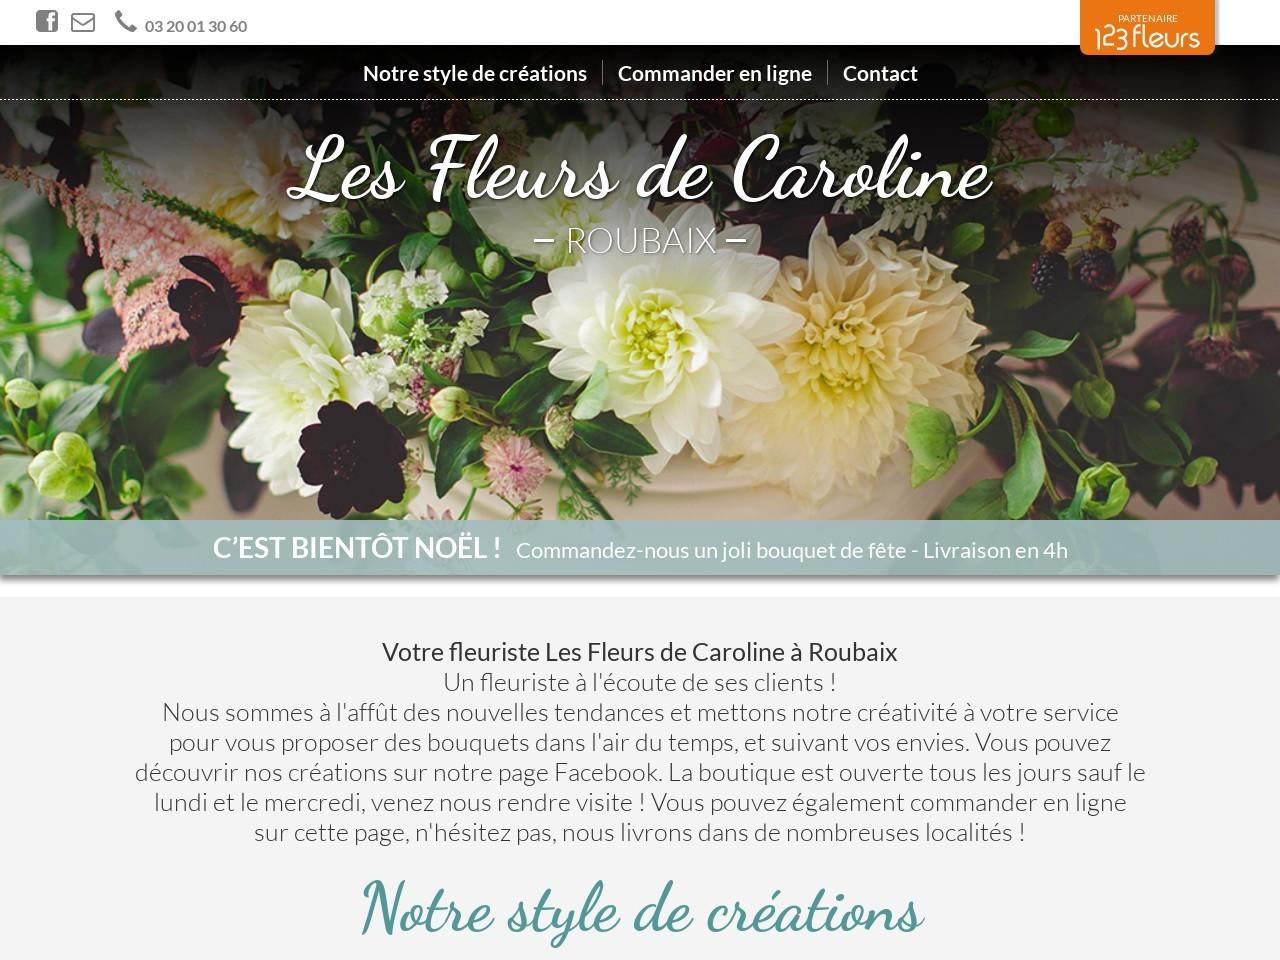 Site fleuriste Les Fleurs de Caroline - 123fleurs